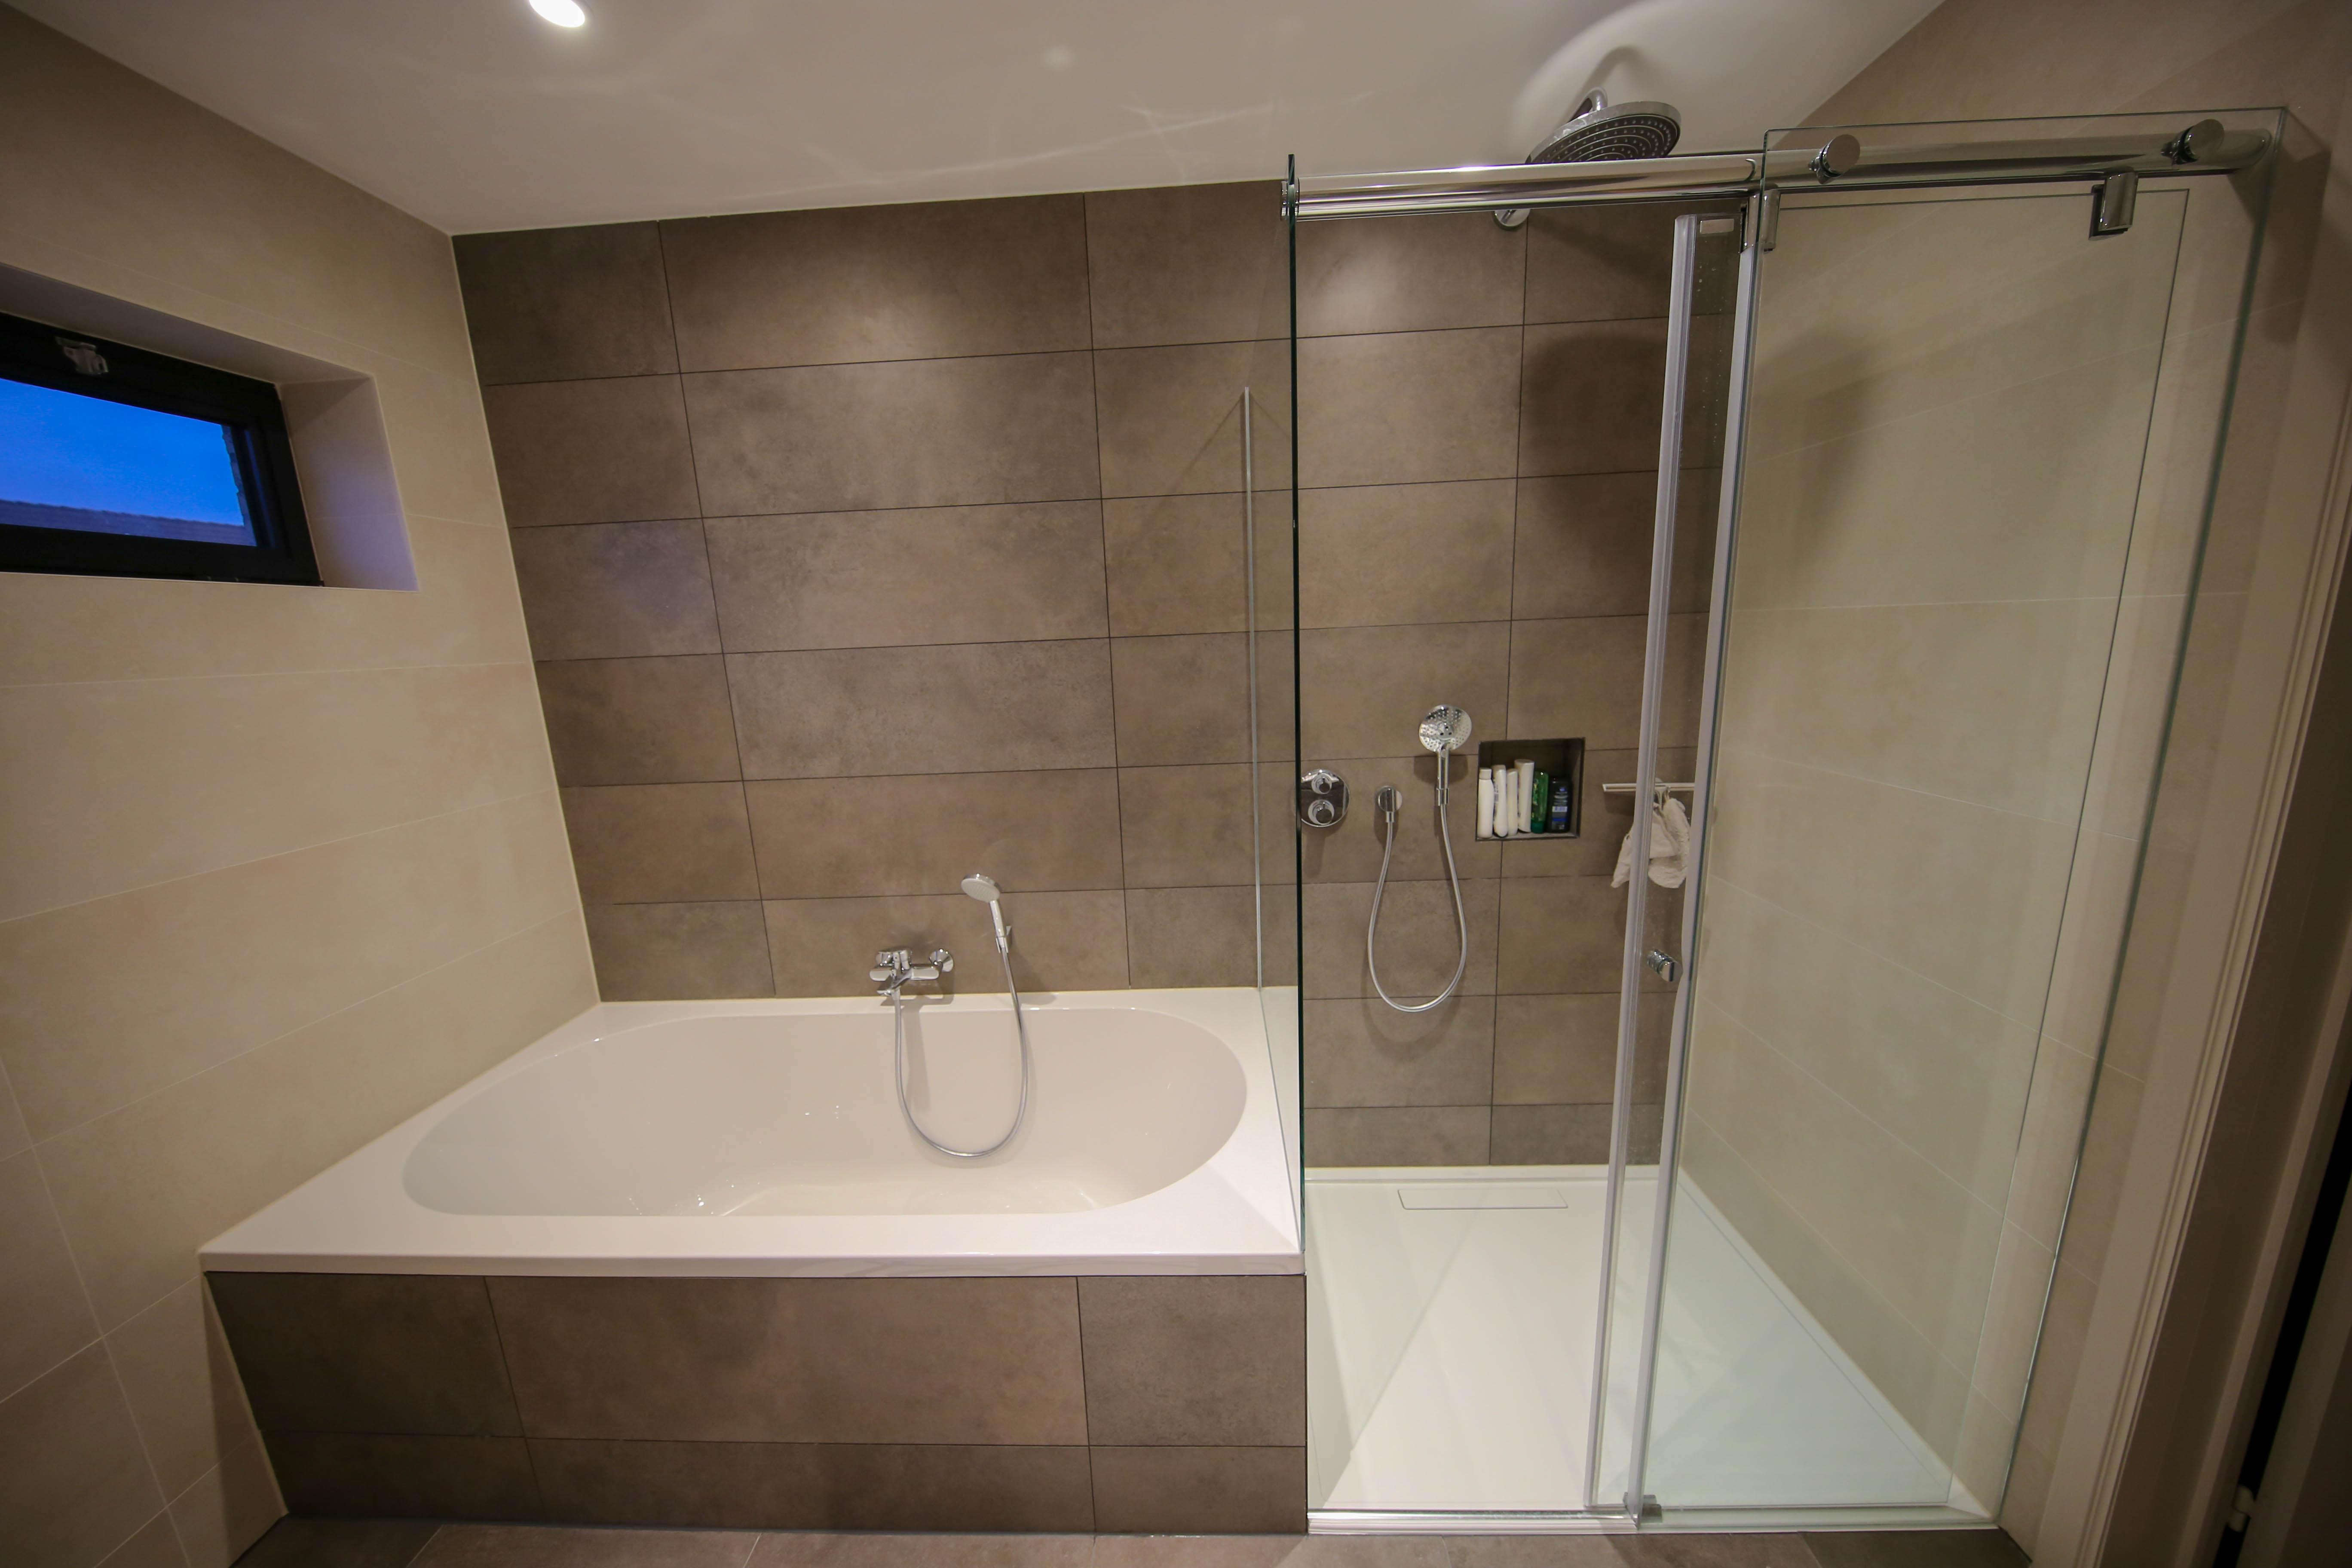 Badkamer wc merksem